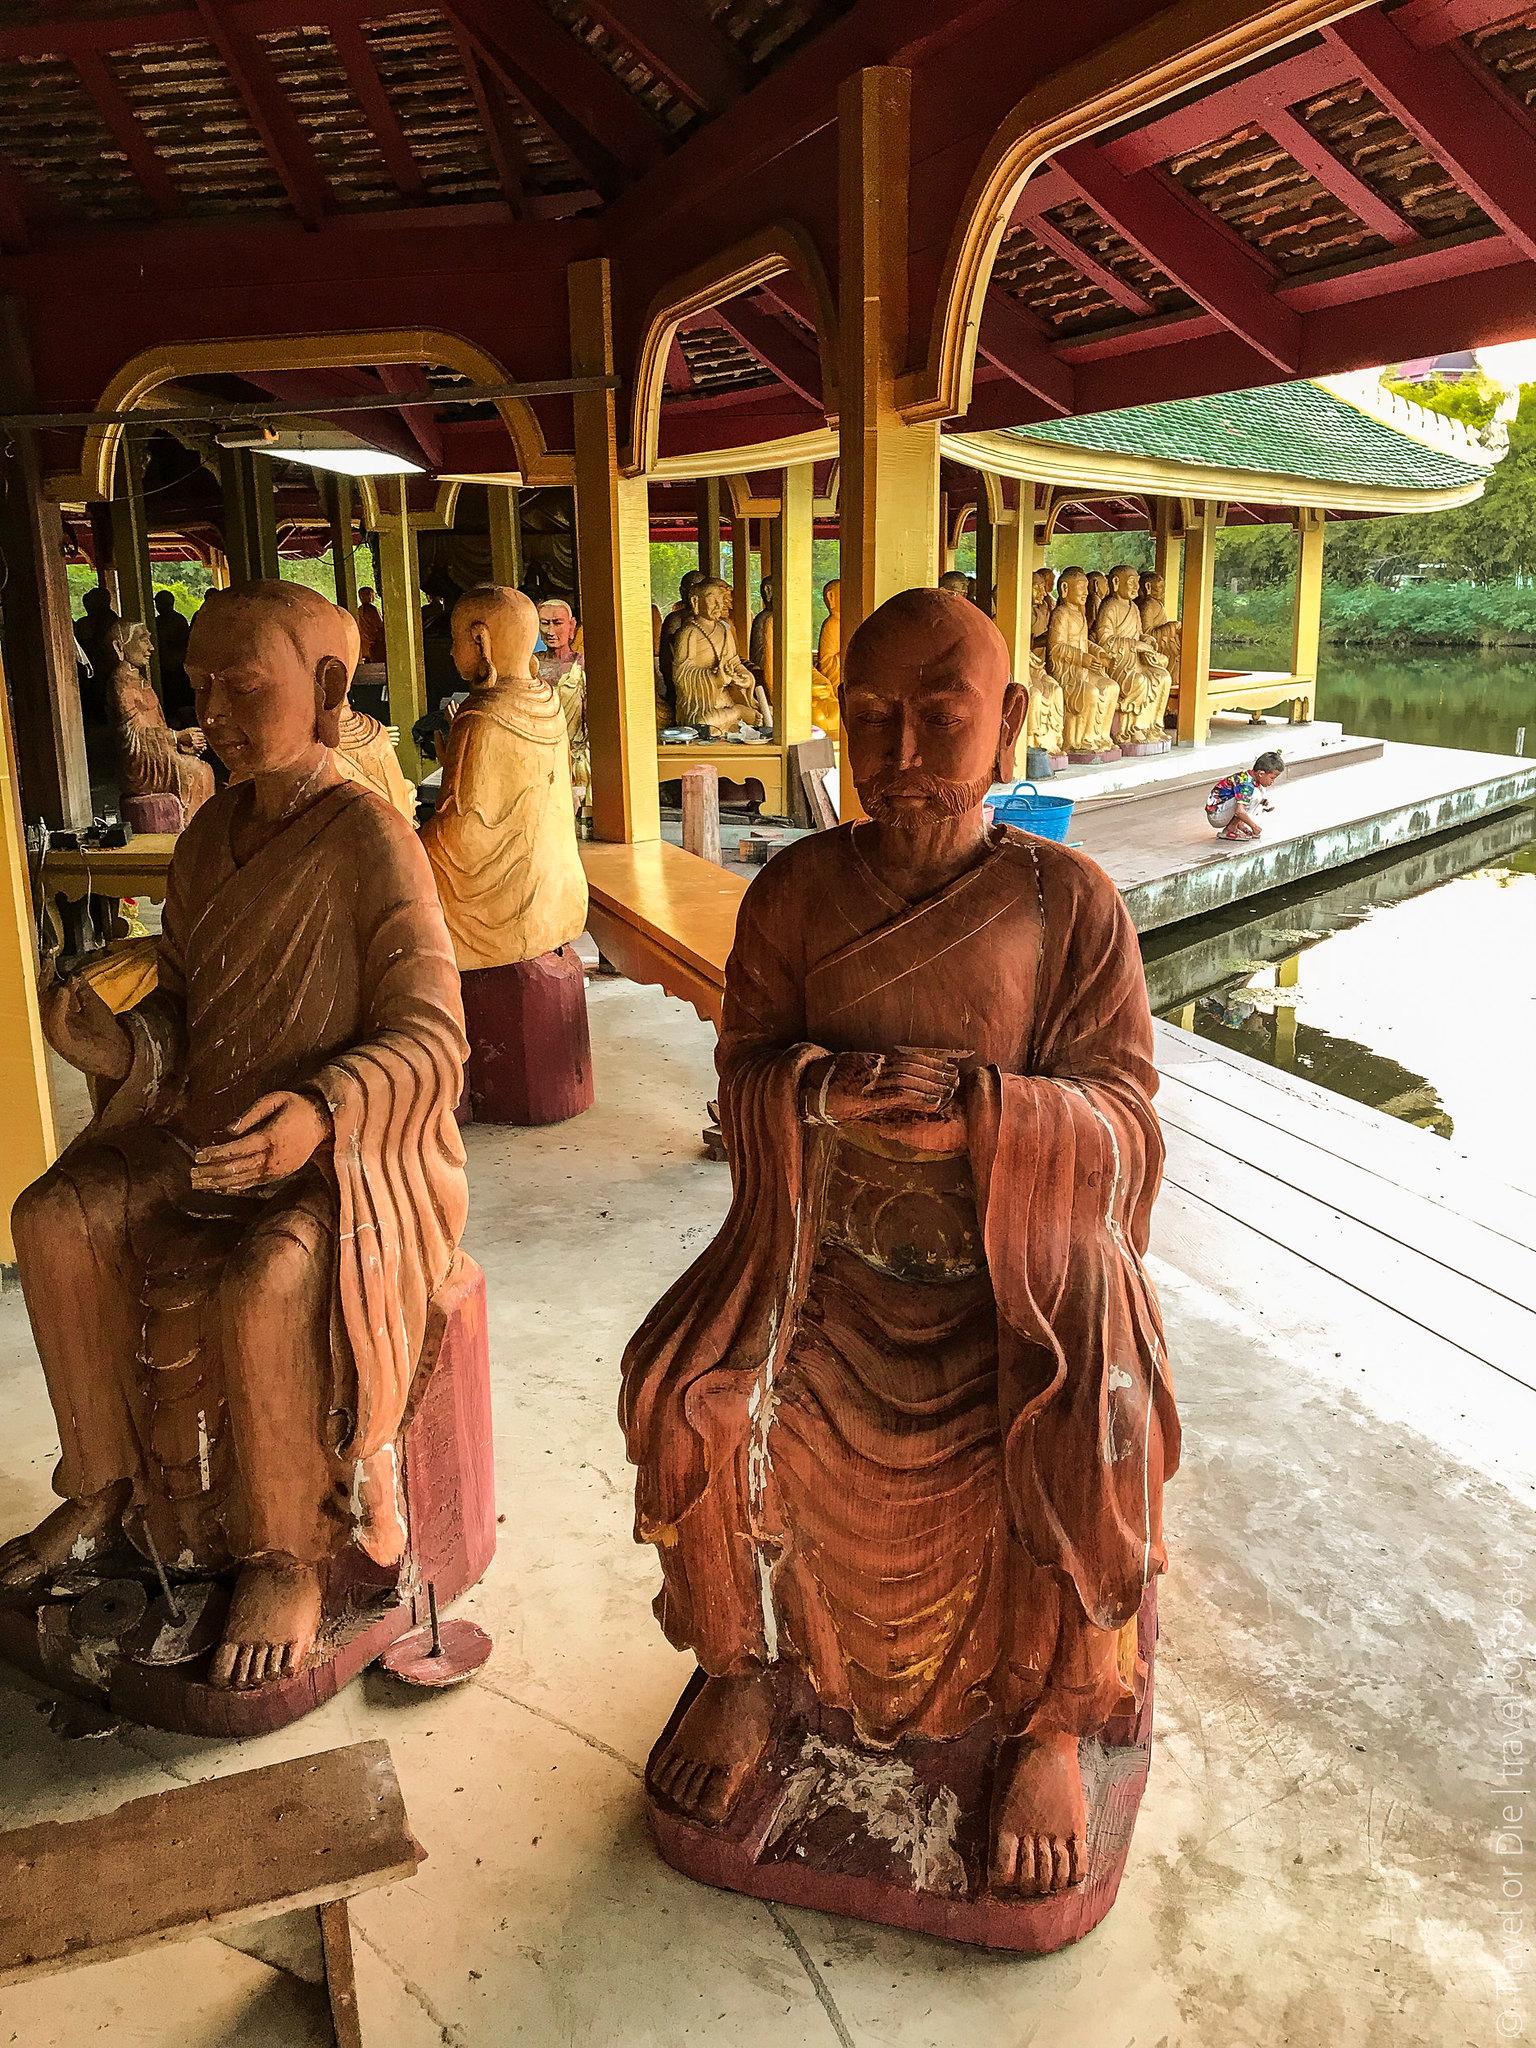 Ancient-City-Muang-Boran-Bangkok-9885